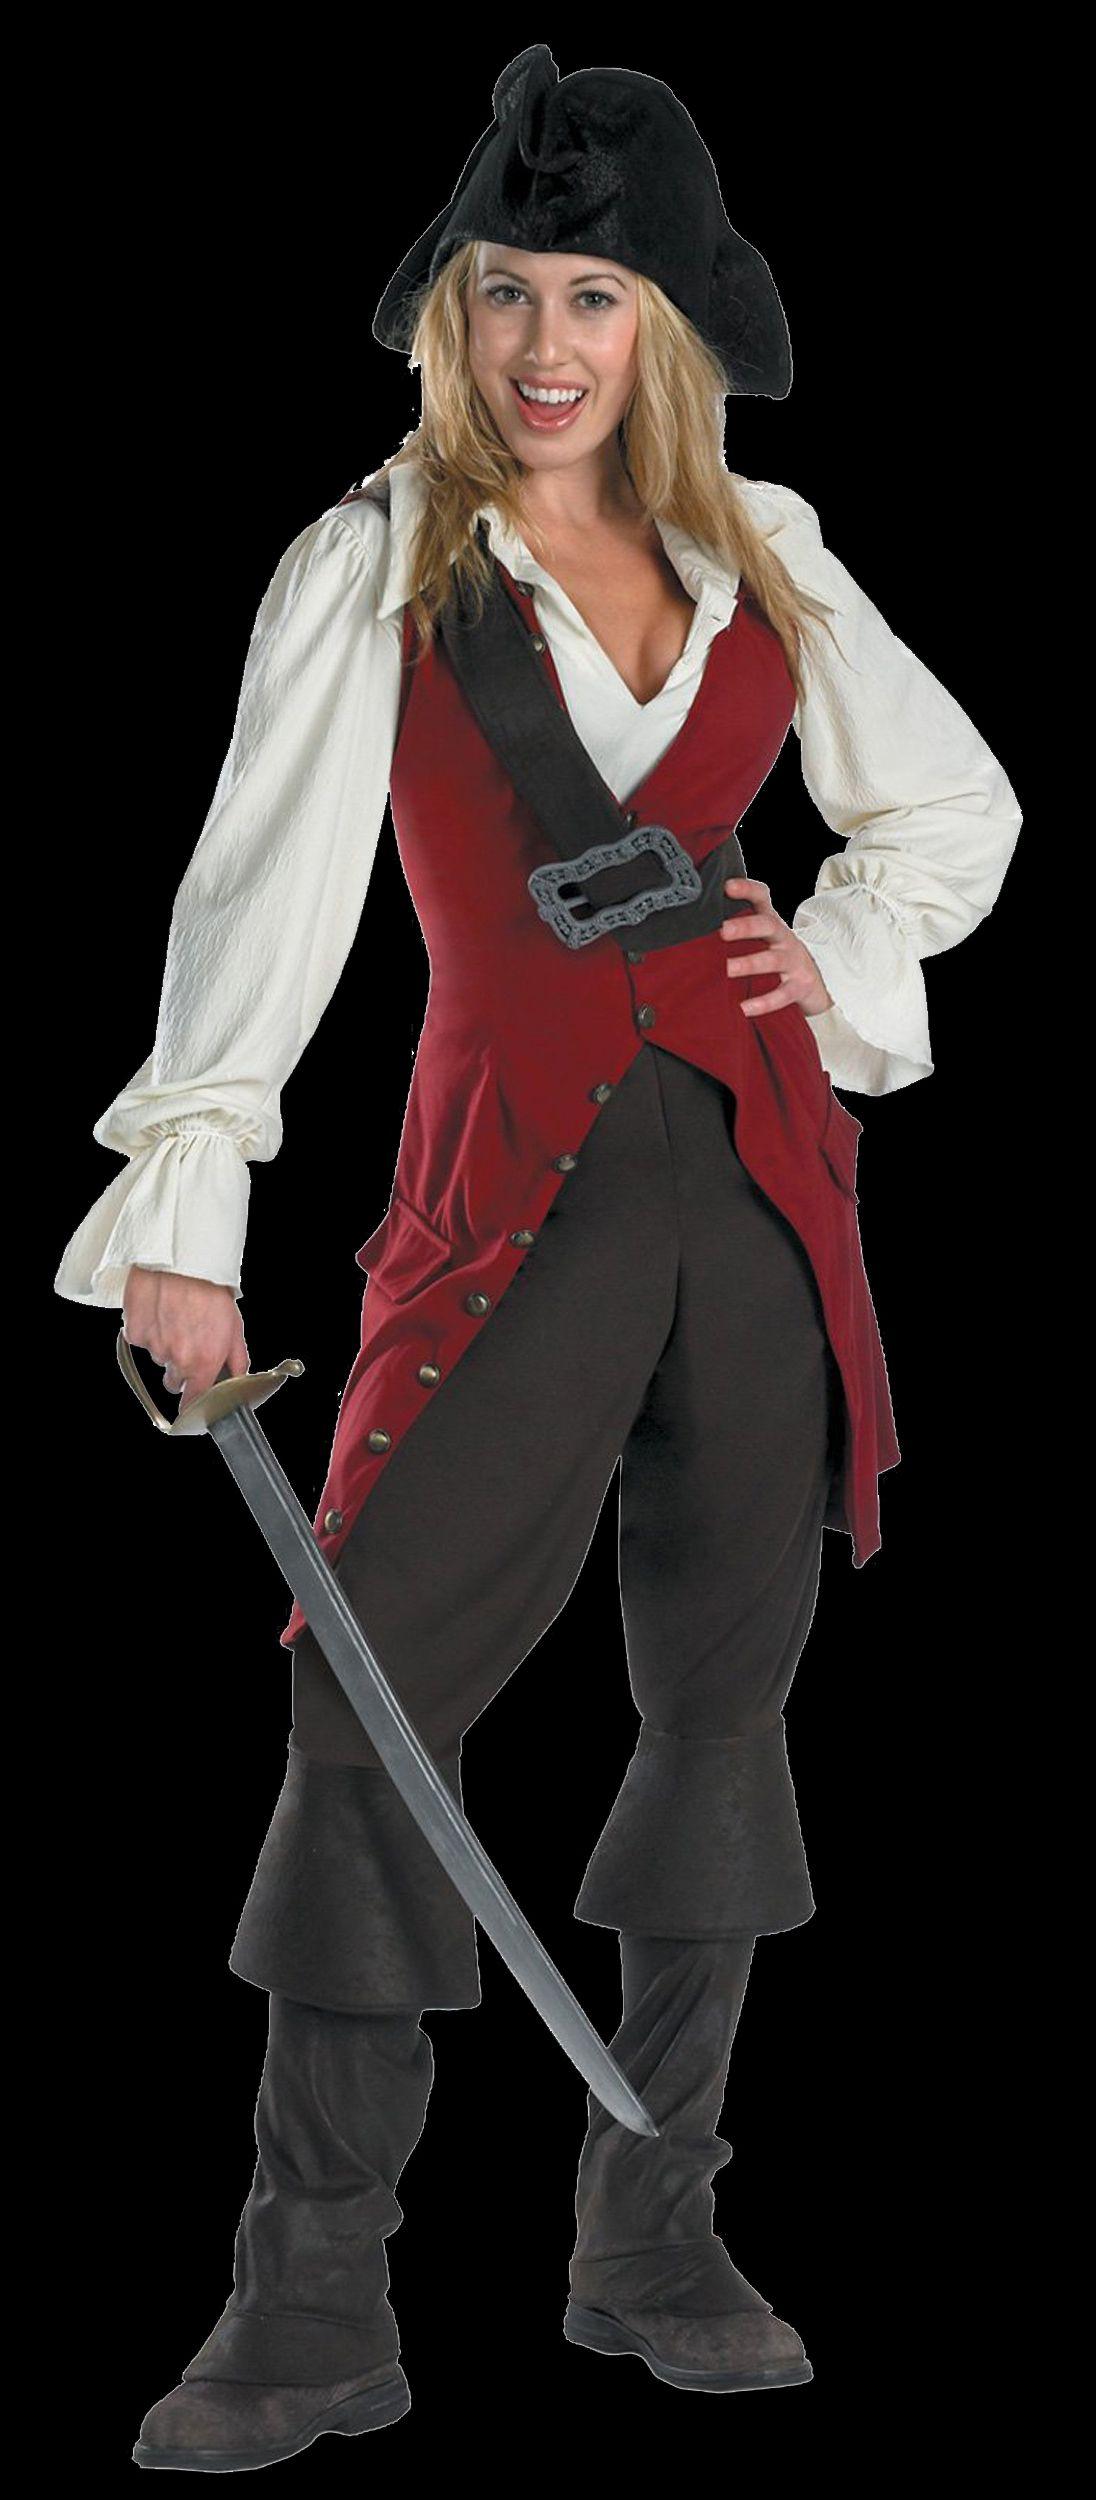 Costumes · Elizabeth Swann dressed like a pirate! Pirates Nightmare in the Caribbean Halloween Party Decorations u0026  sc 1 st  Pinterest & Elizabeth Swann dressed like a pirate! Pirates Nightmare in the ...